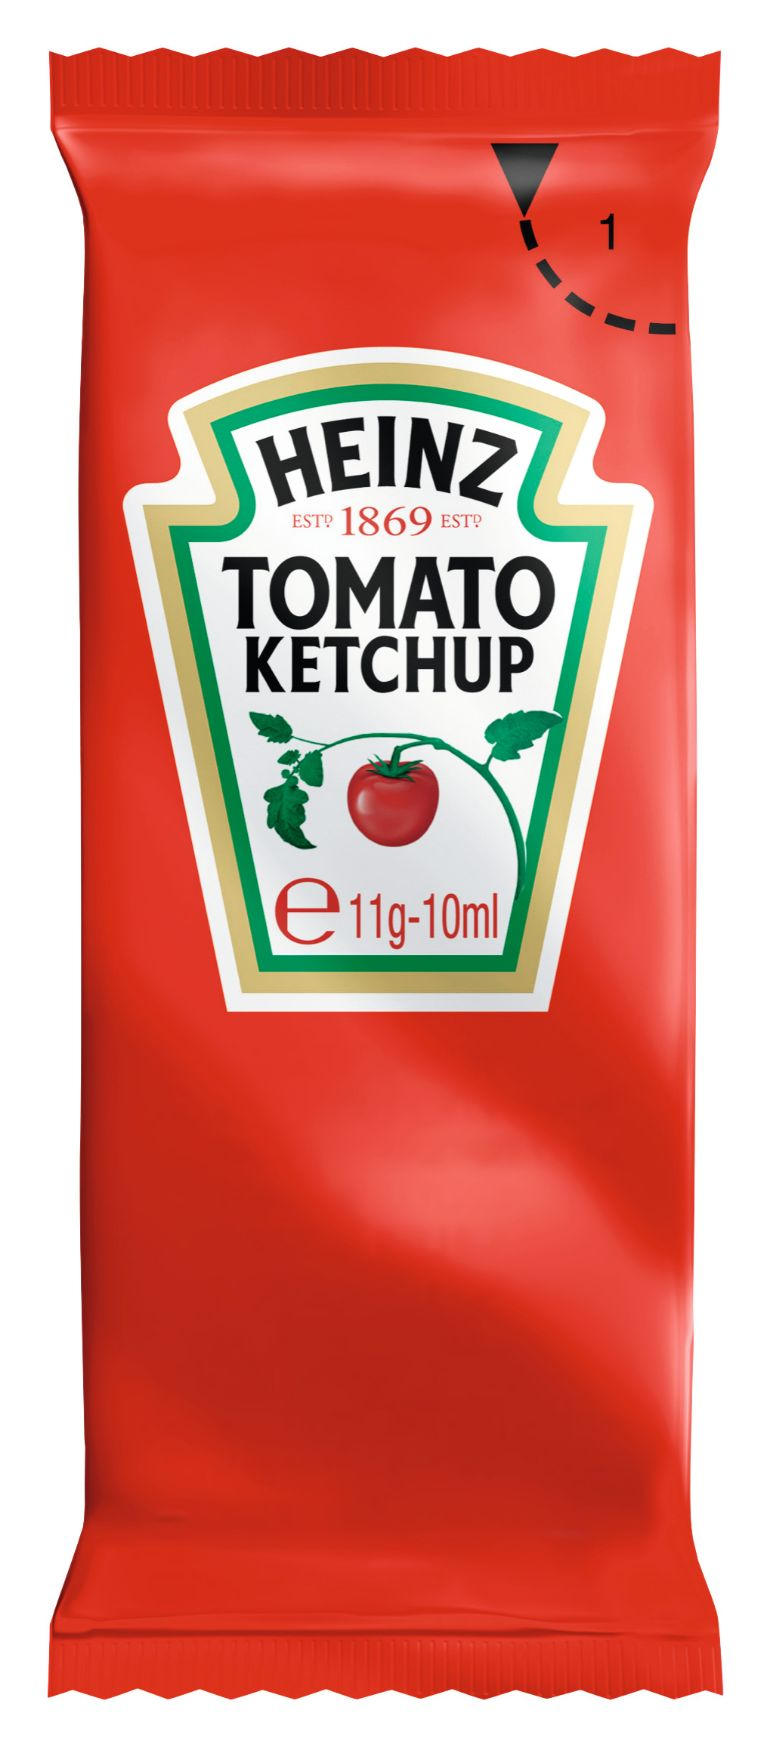 Heinz Tomaten Ketchup11g image